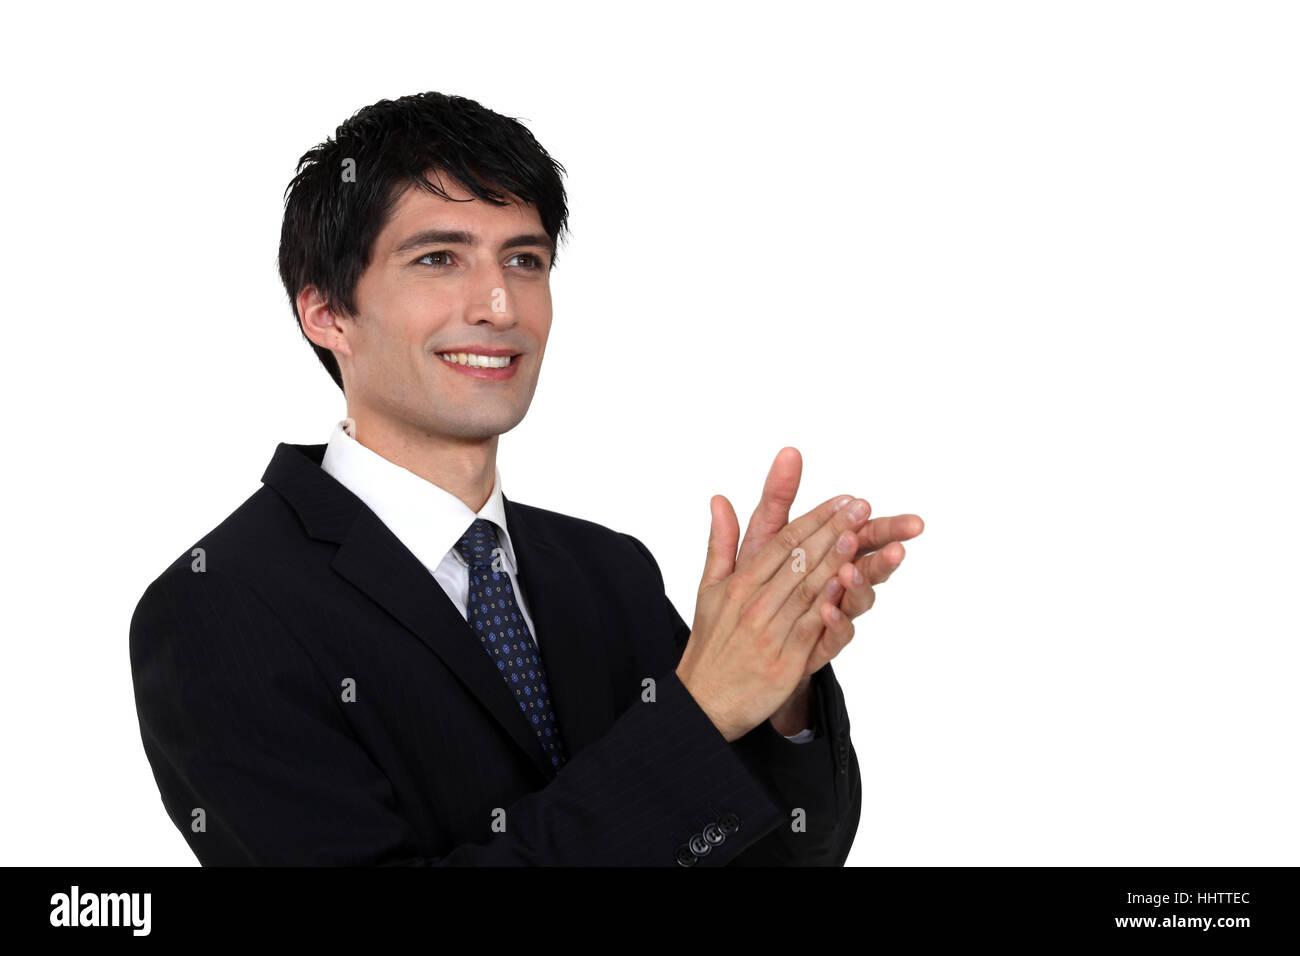 Accord, applaudir, applaudissements, acclamations, applaudissements, acclamations, de l'adulation, Guy, Photo Stock